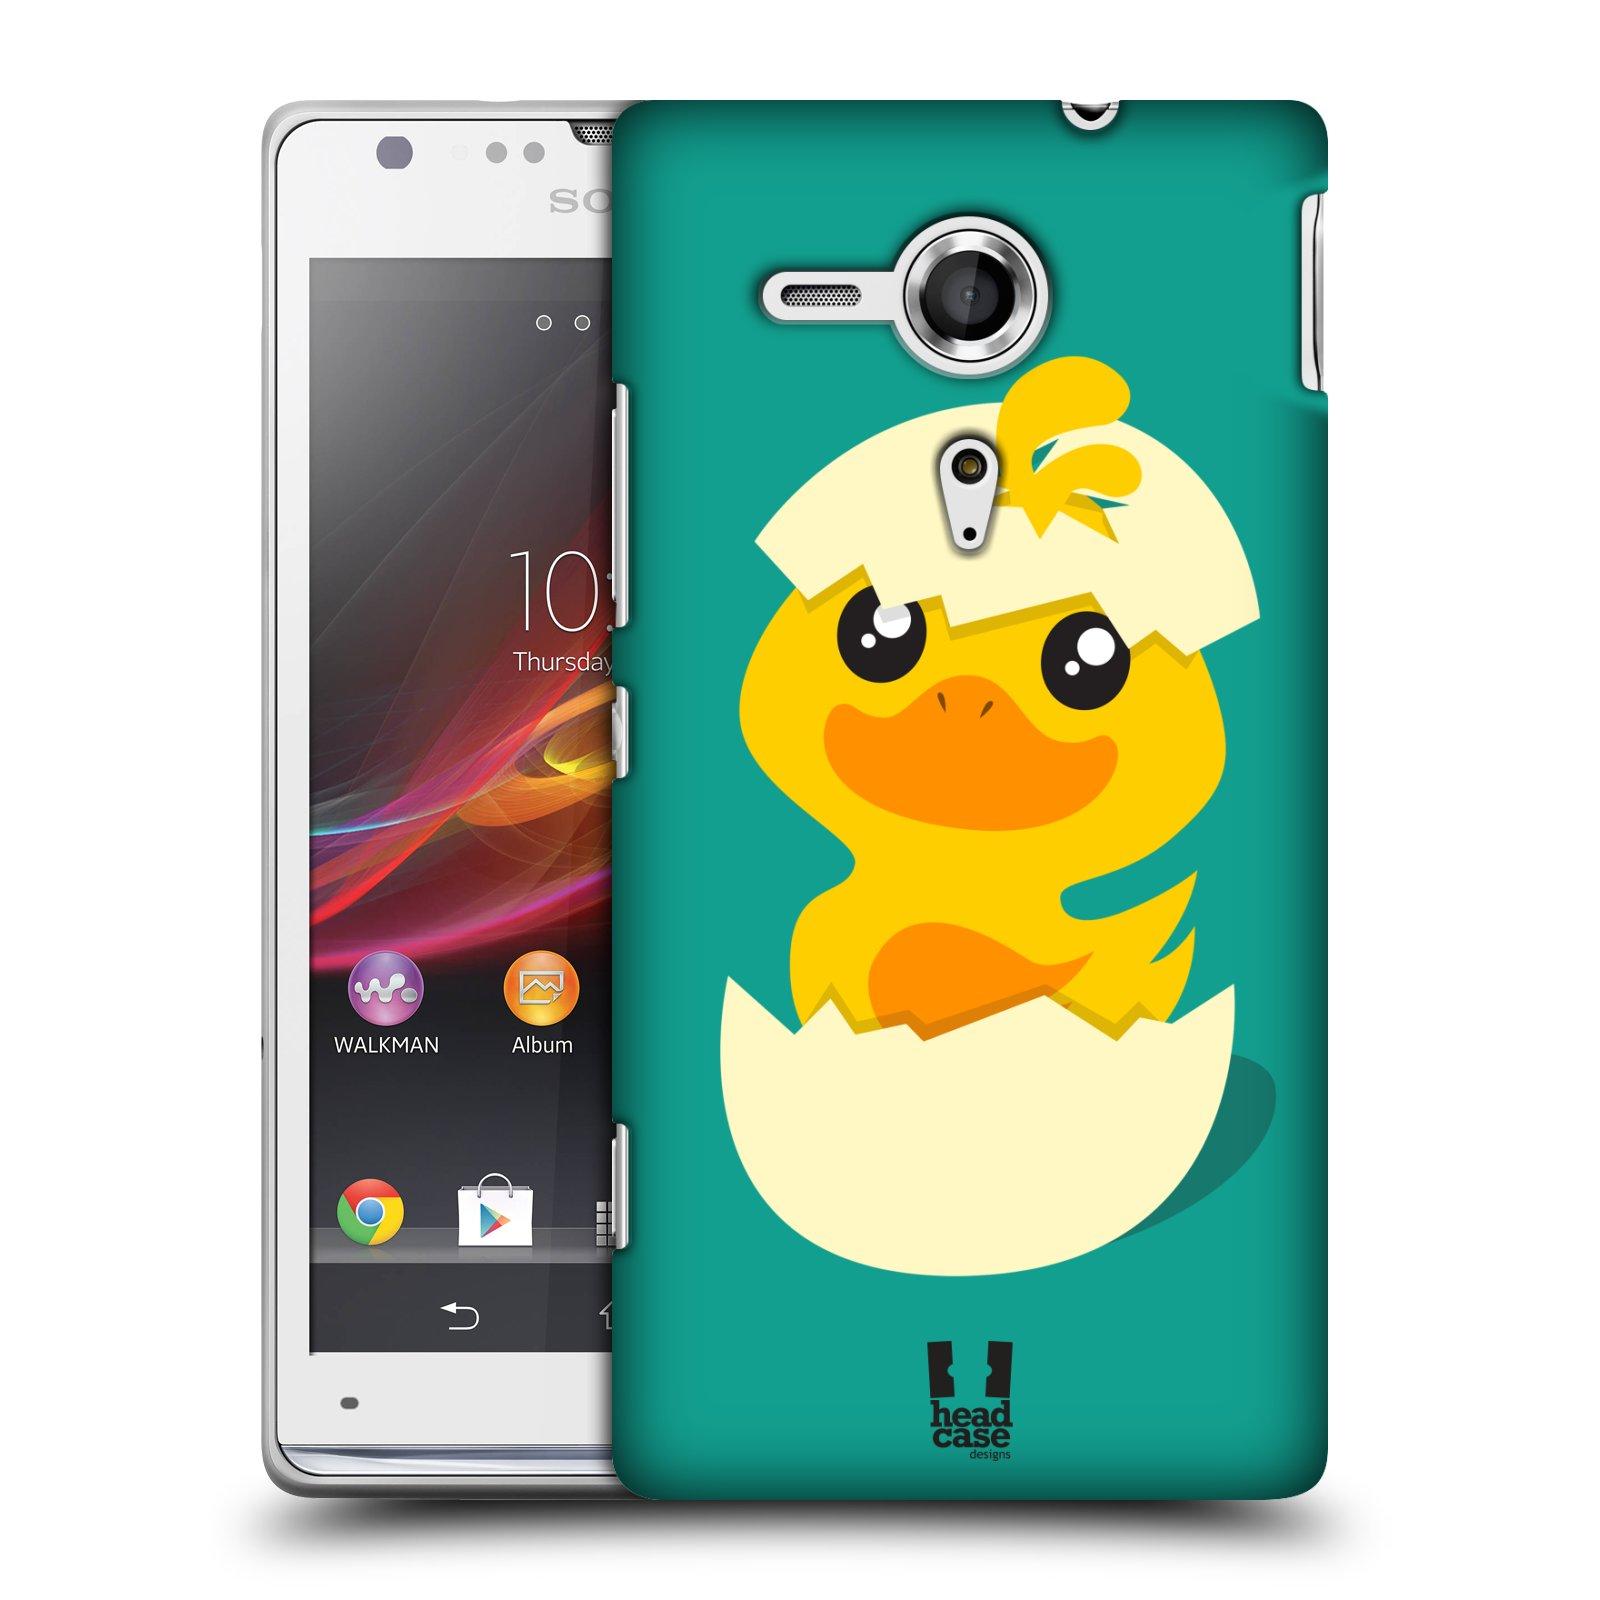 Plastové pouzdro na mobil Sony Xperia SP C5303 HEAD CASE KACHNIČKA Z VAJÍČKA (Kryt či obal na mobilní telefon Sony Xperia SP )